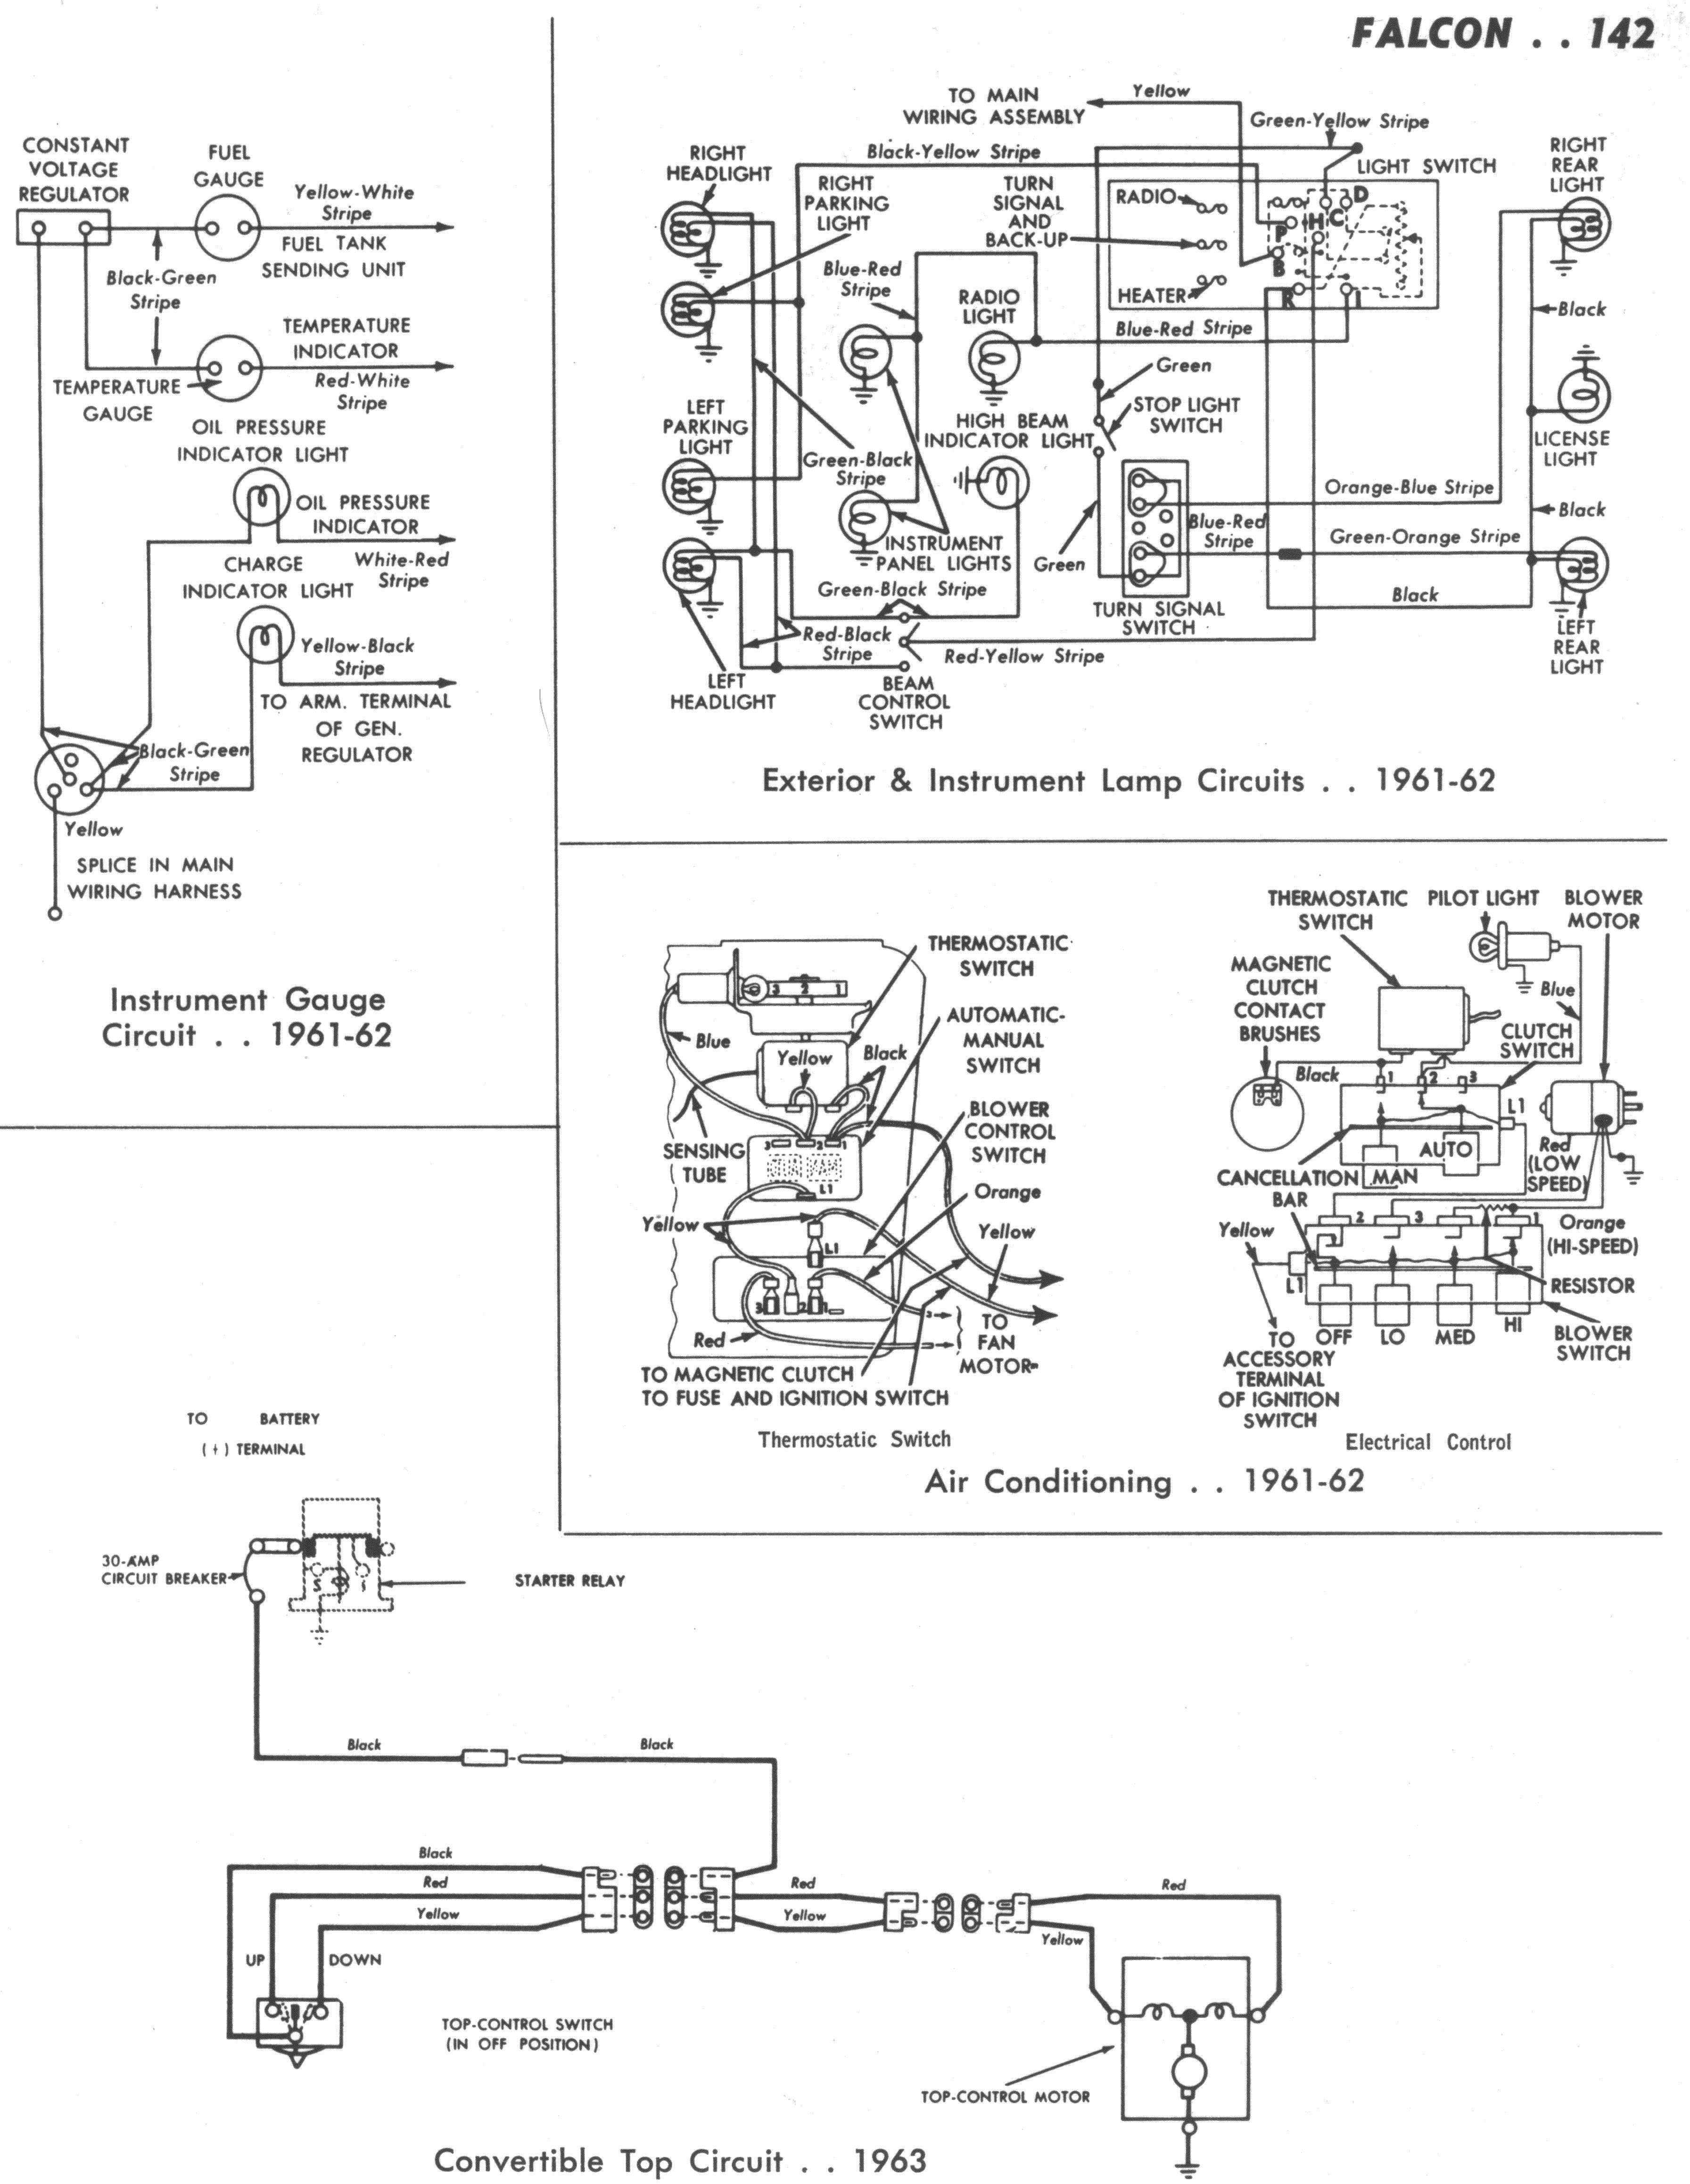 medium resolution of new wiring diagram ford falcon au radio diagram diagramtemplatenew wiring diagram ford falcon au radio diagram